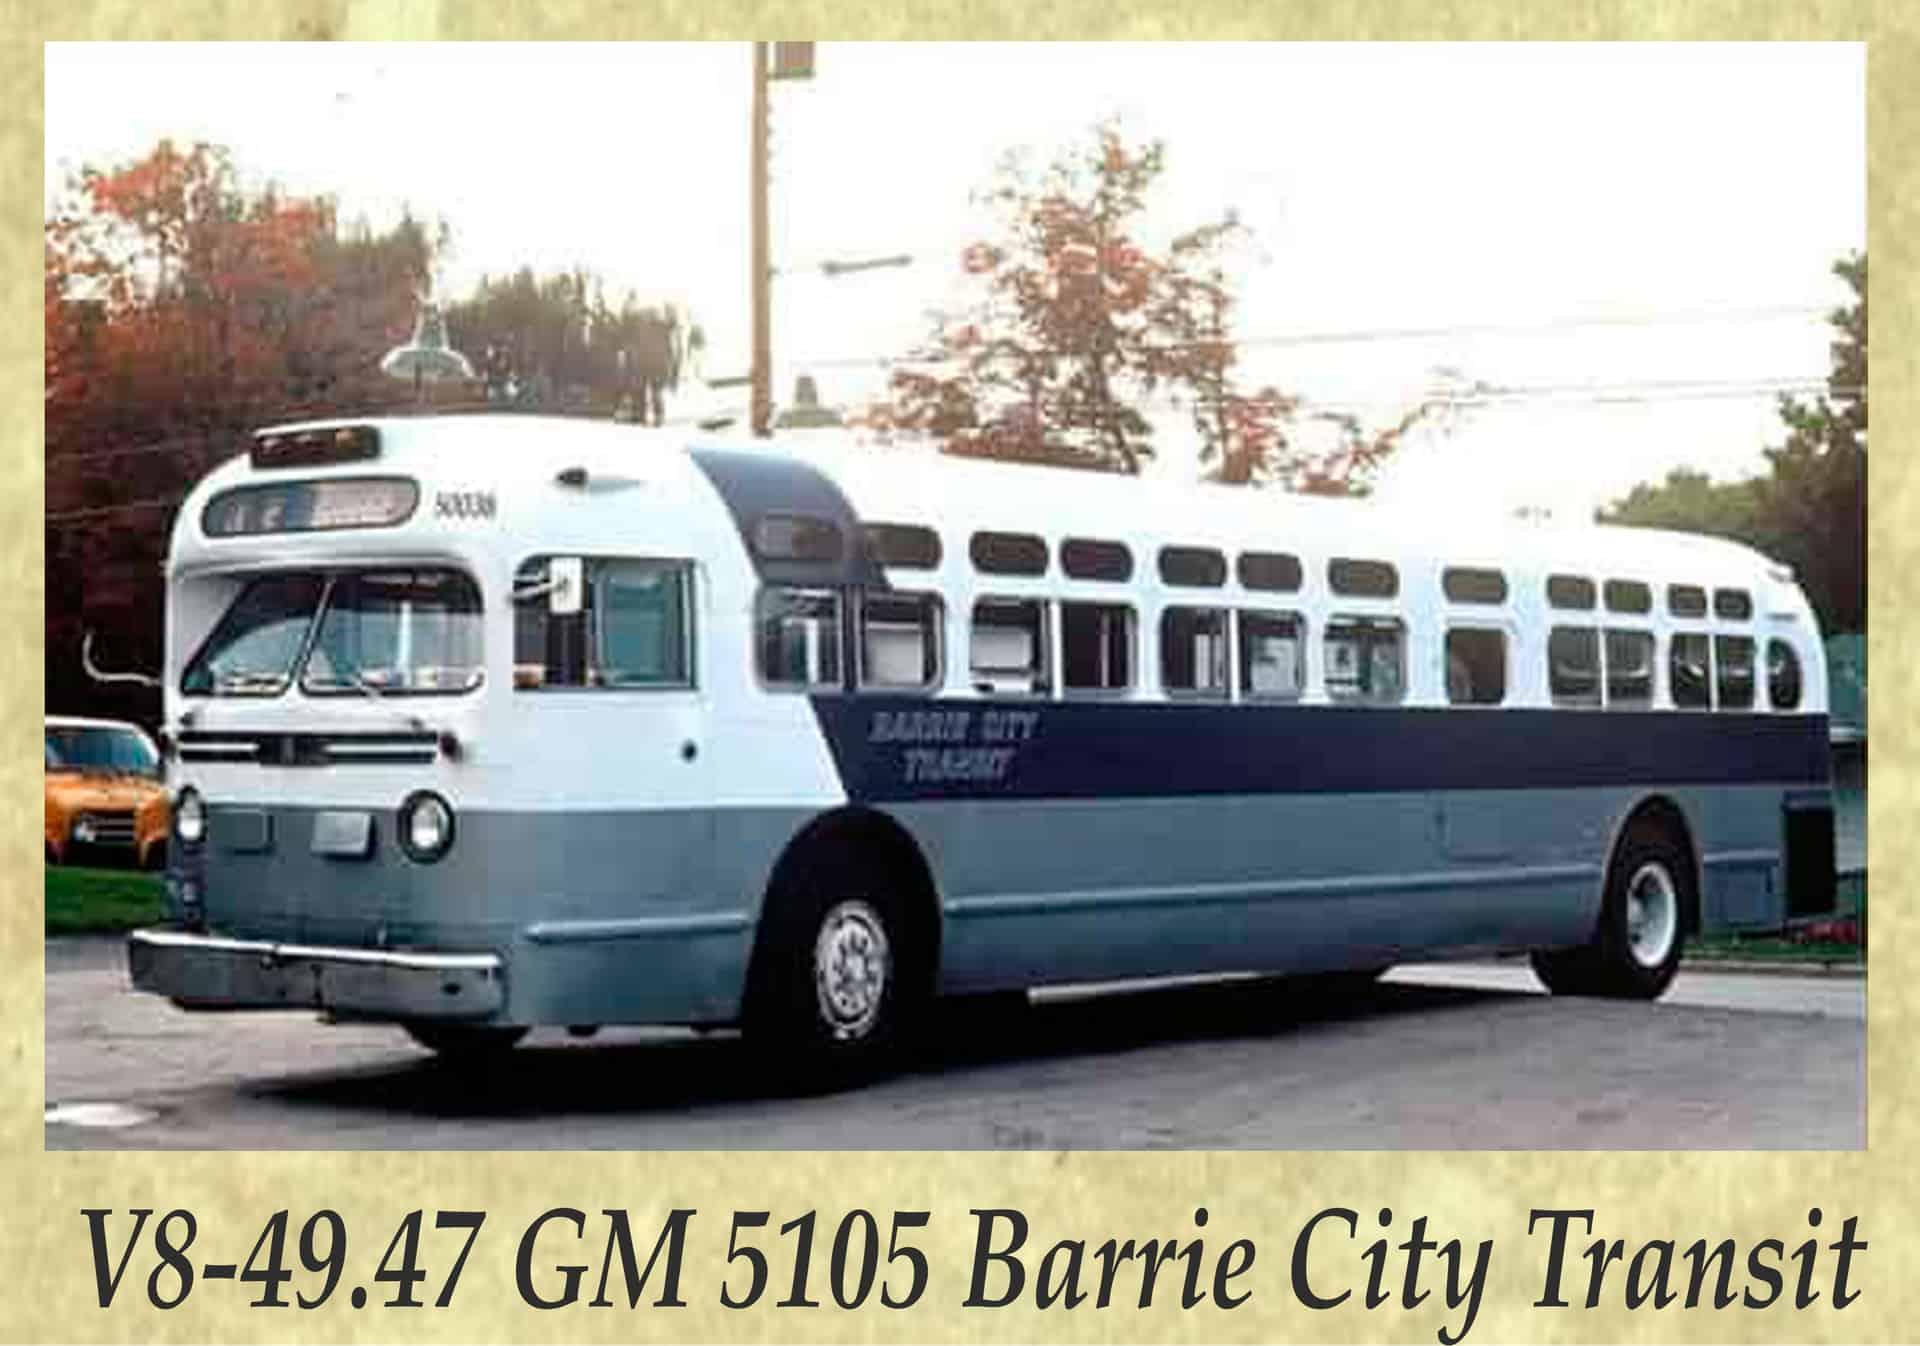 V8-49.47 GM 5105 Barrie City Transit